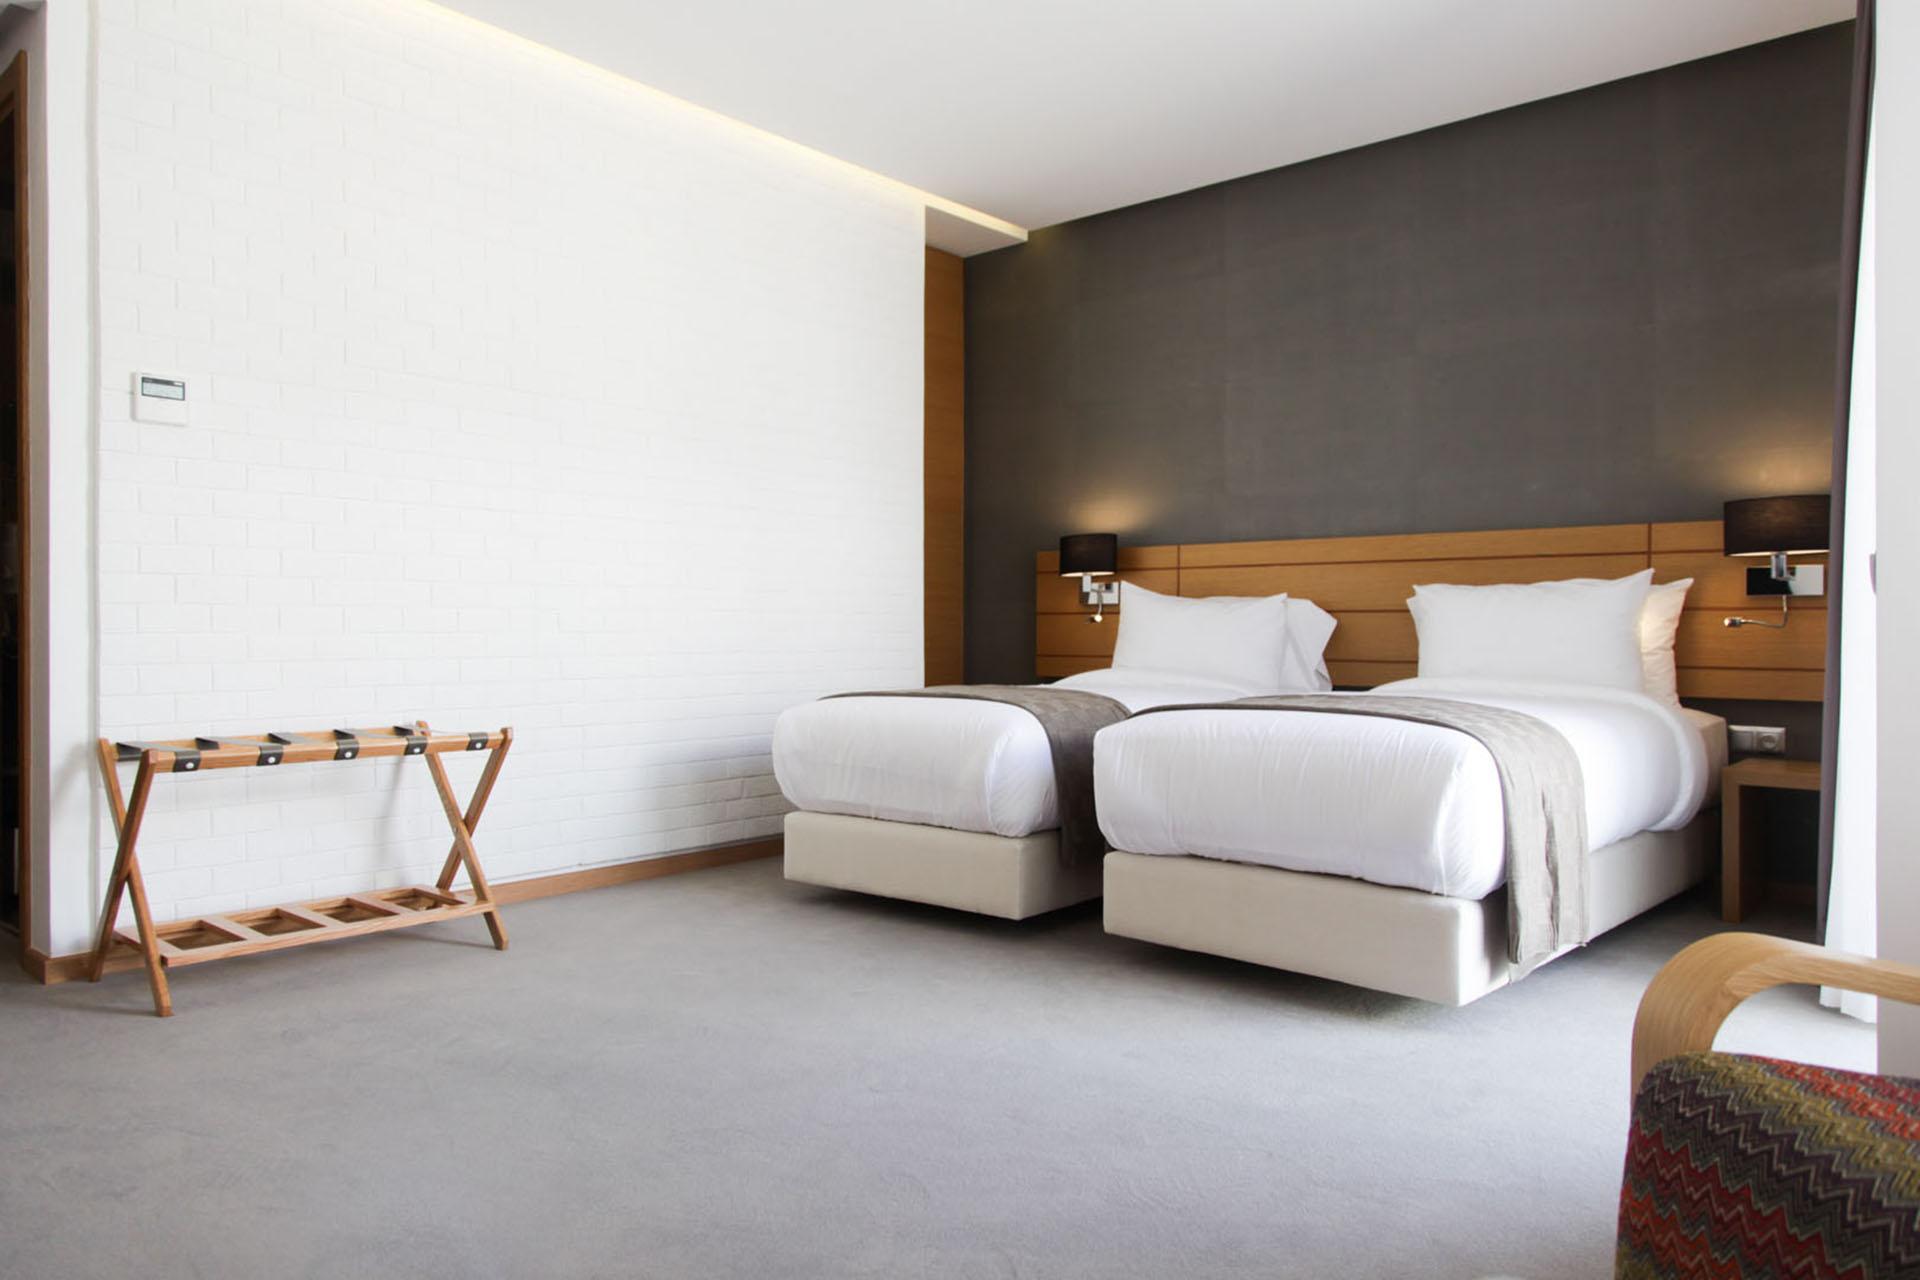 http://smartshotel.com/wp-content/uploads/2016/10/Superior-Room-4.jpg